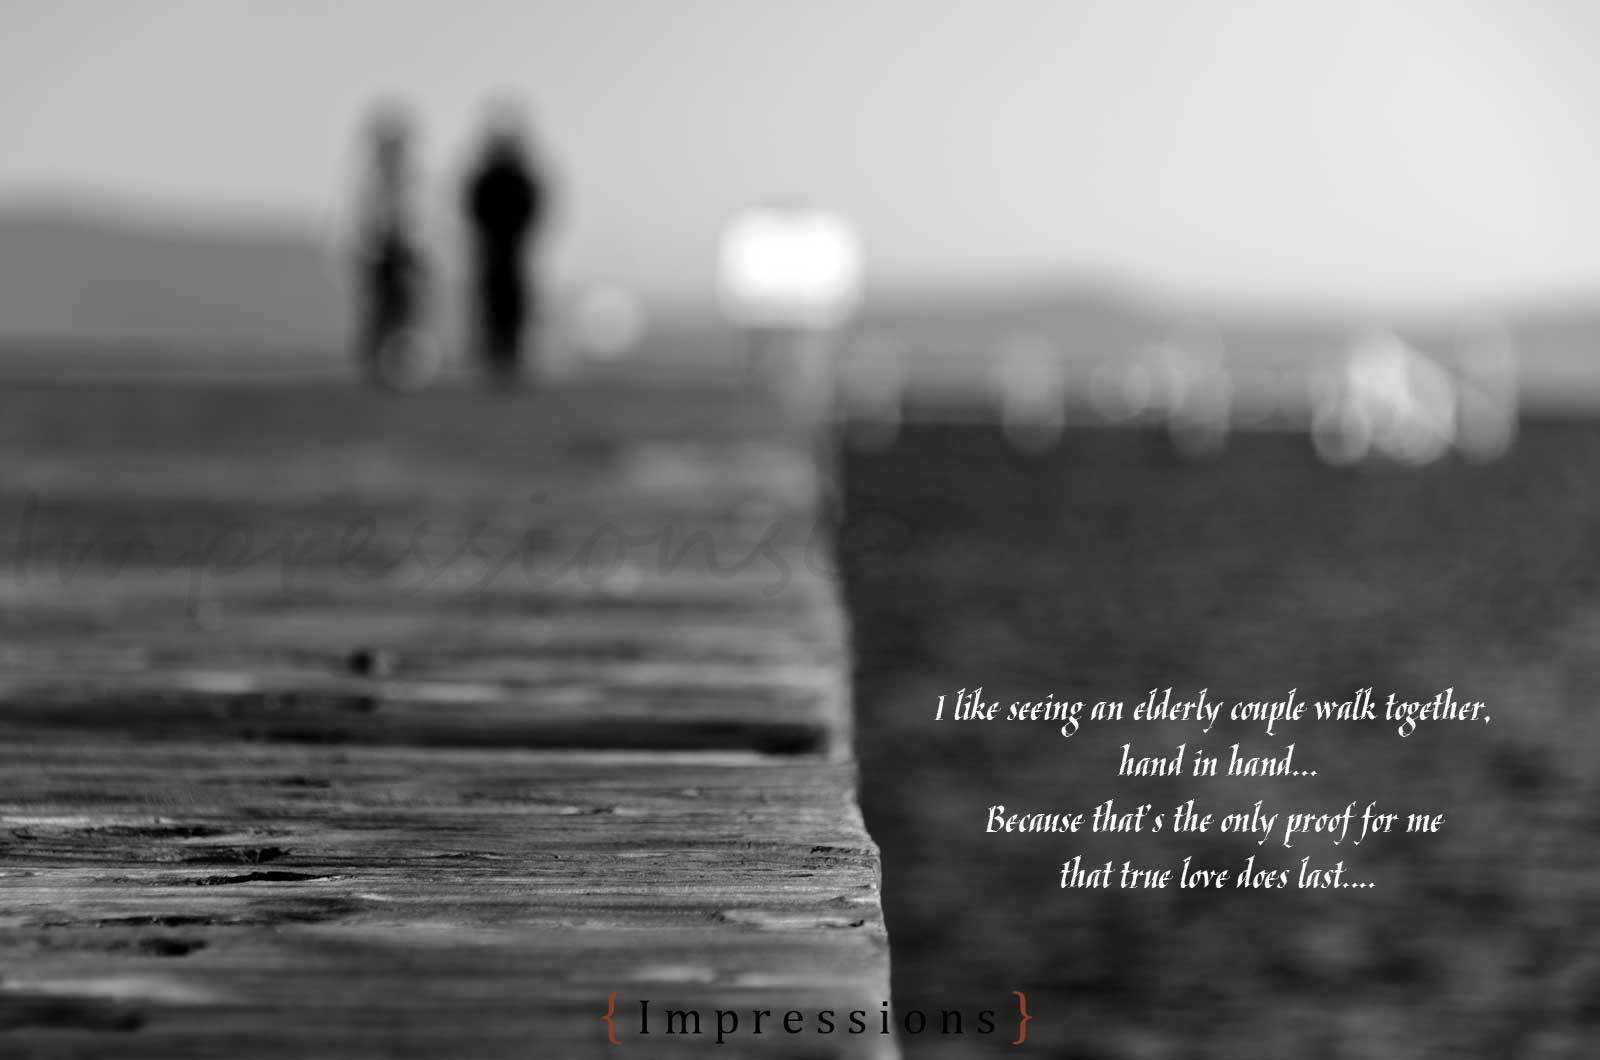 true love does last